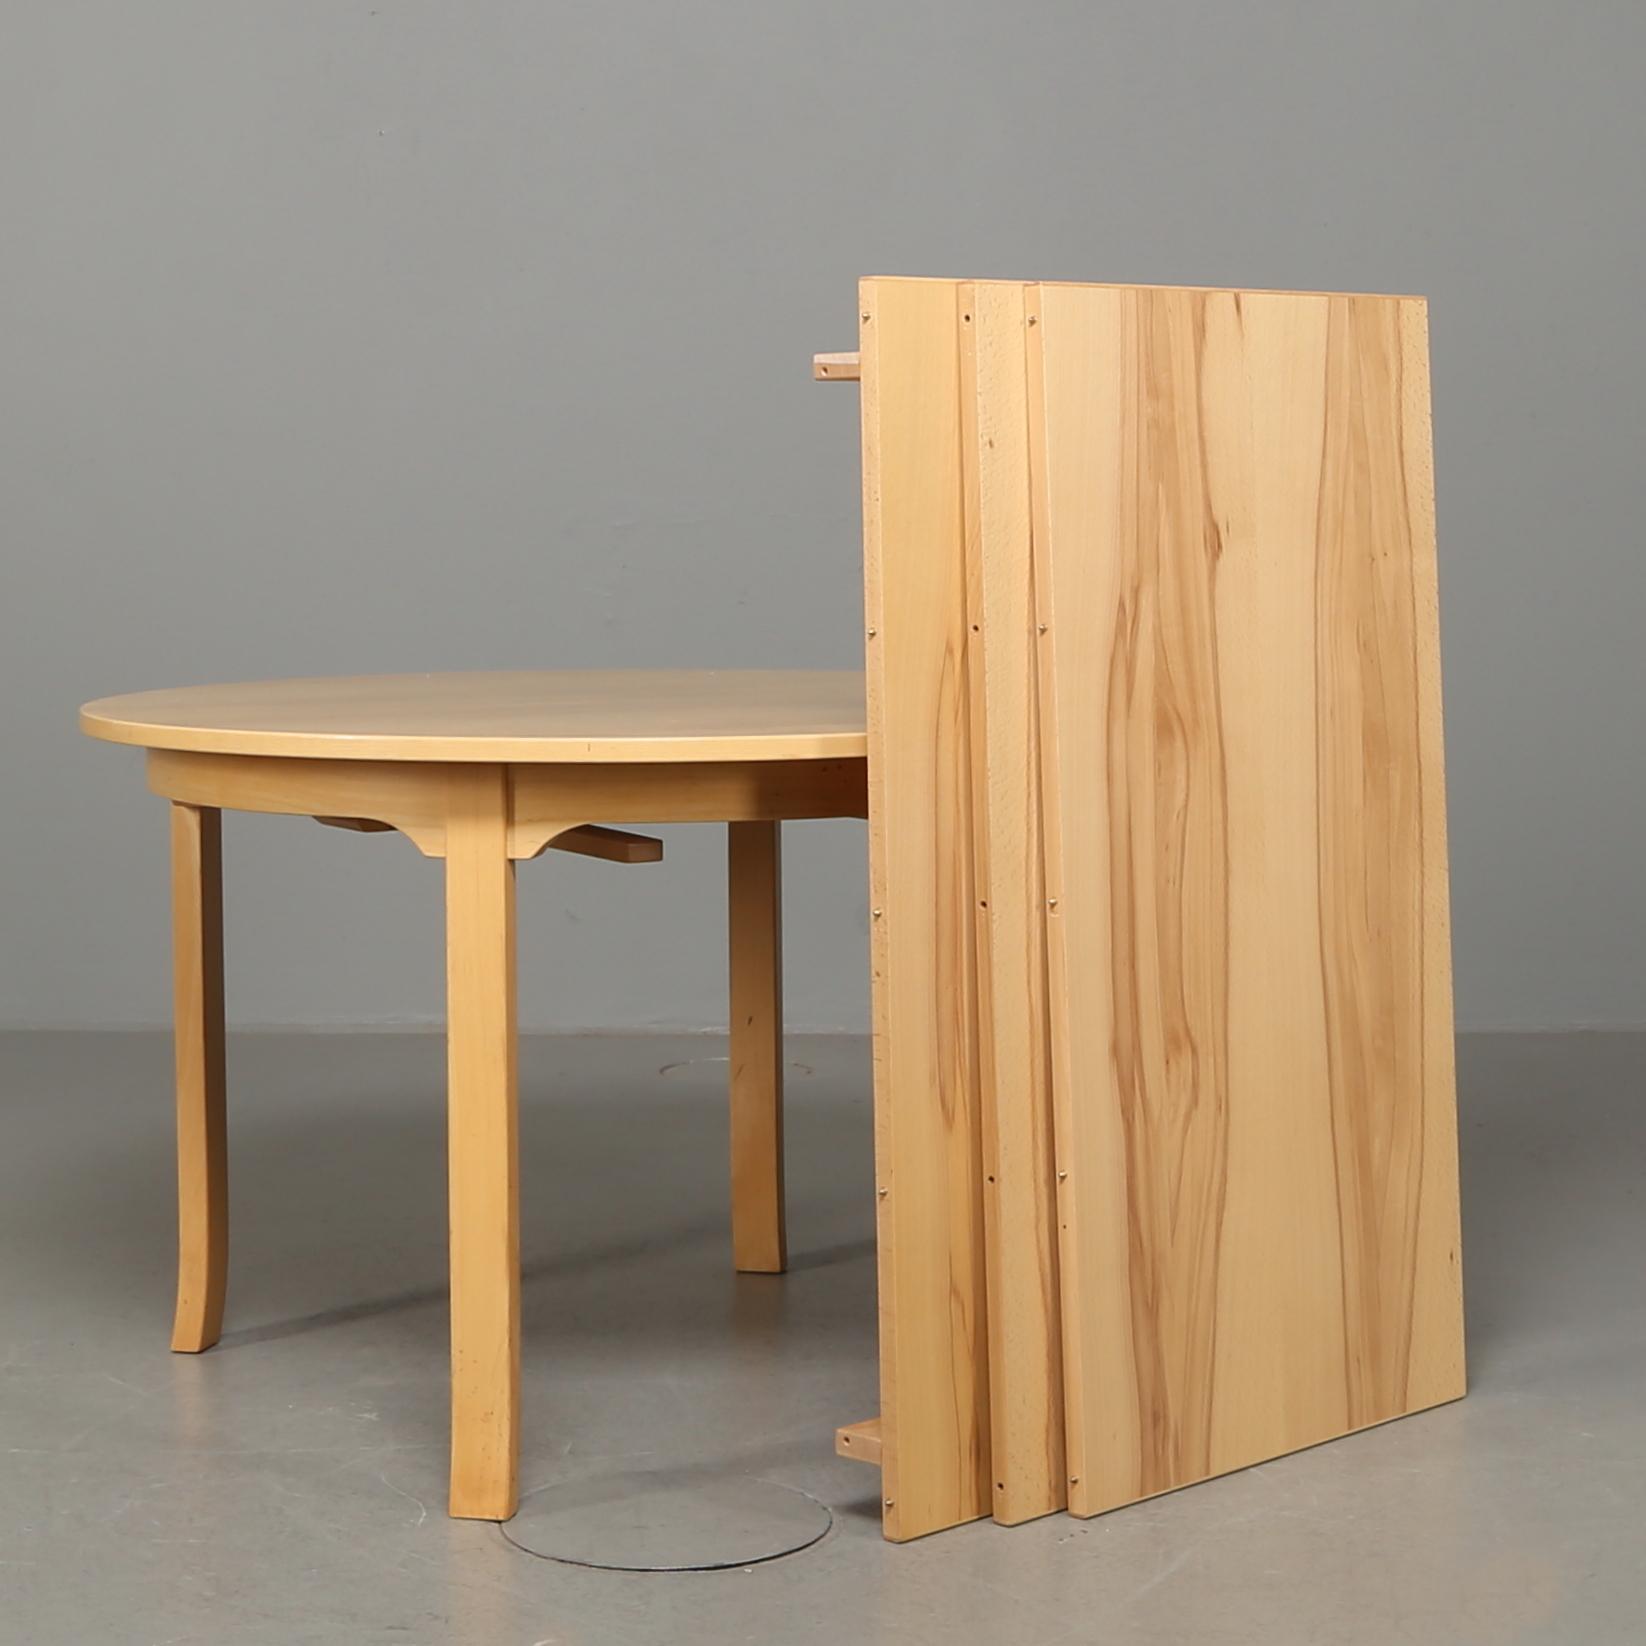 MATBORD, bok, sent 1900 tal. Furniture Tables Auctionet